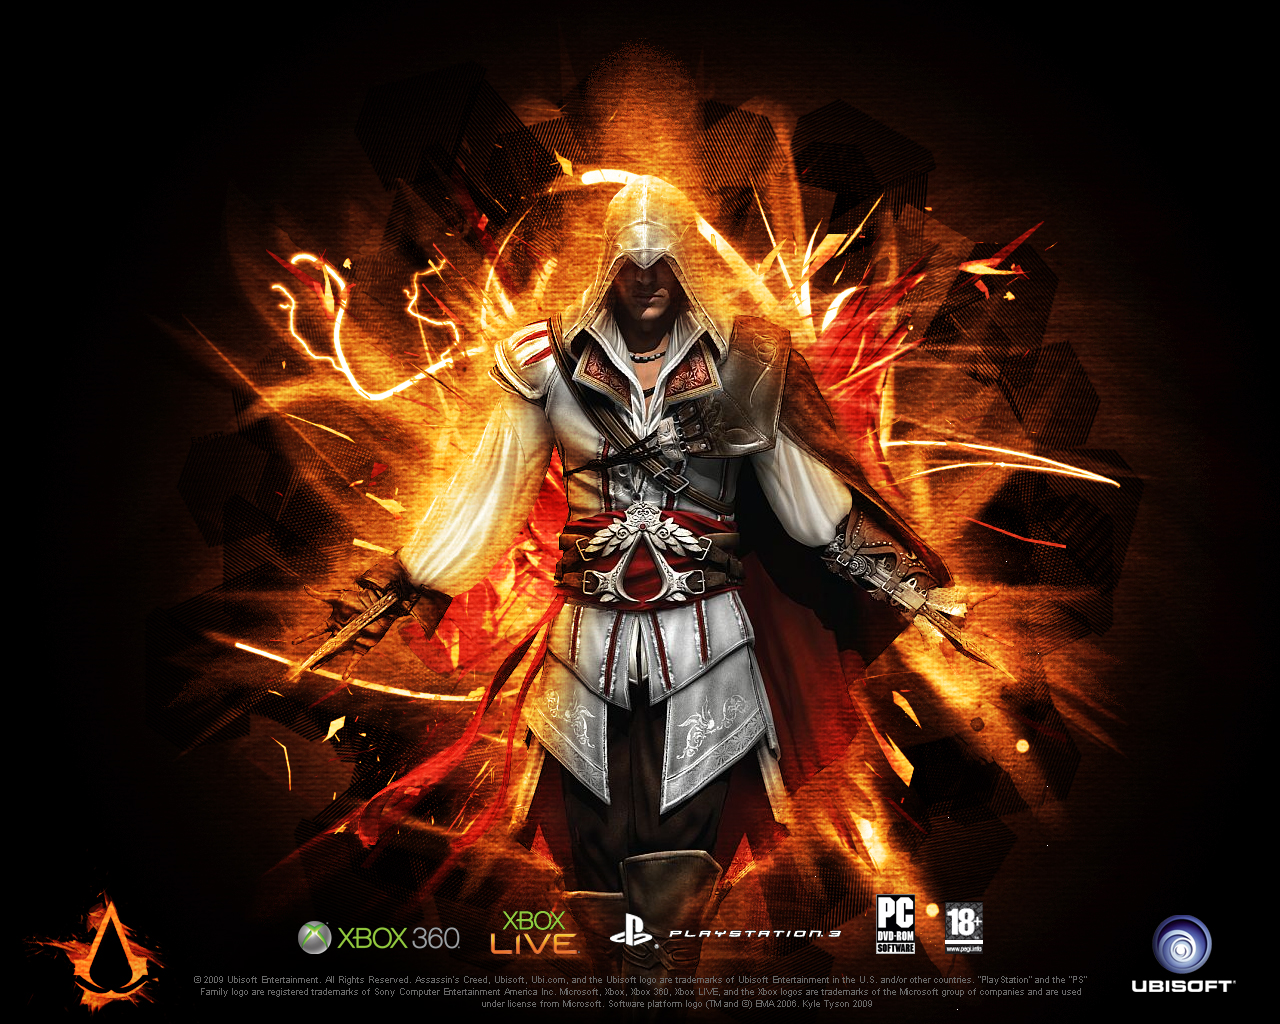 Assassins Creed II Computer Wallpapers Desktop Backgrounds 1280x1024